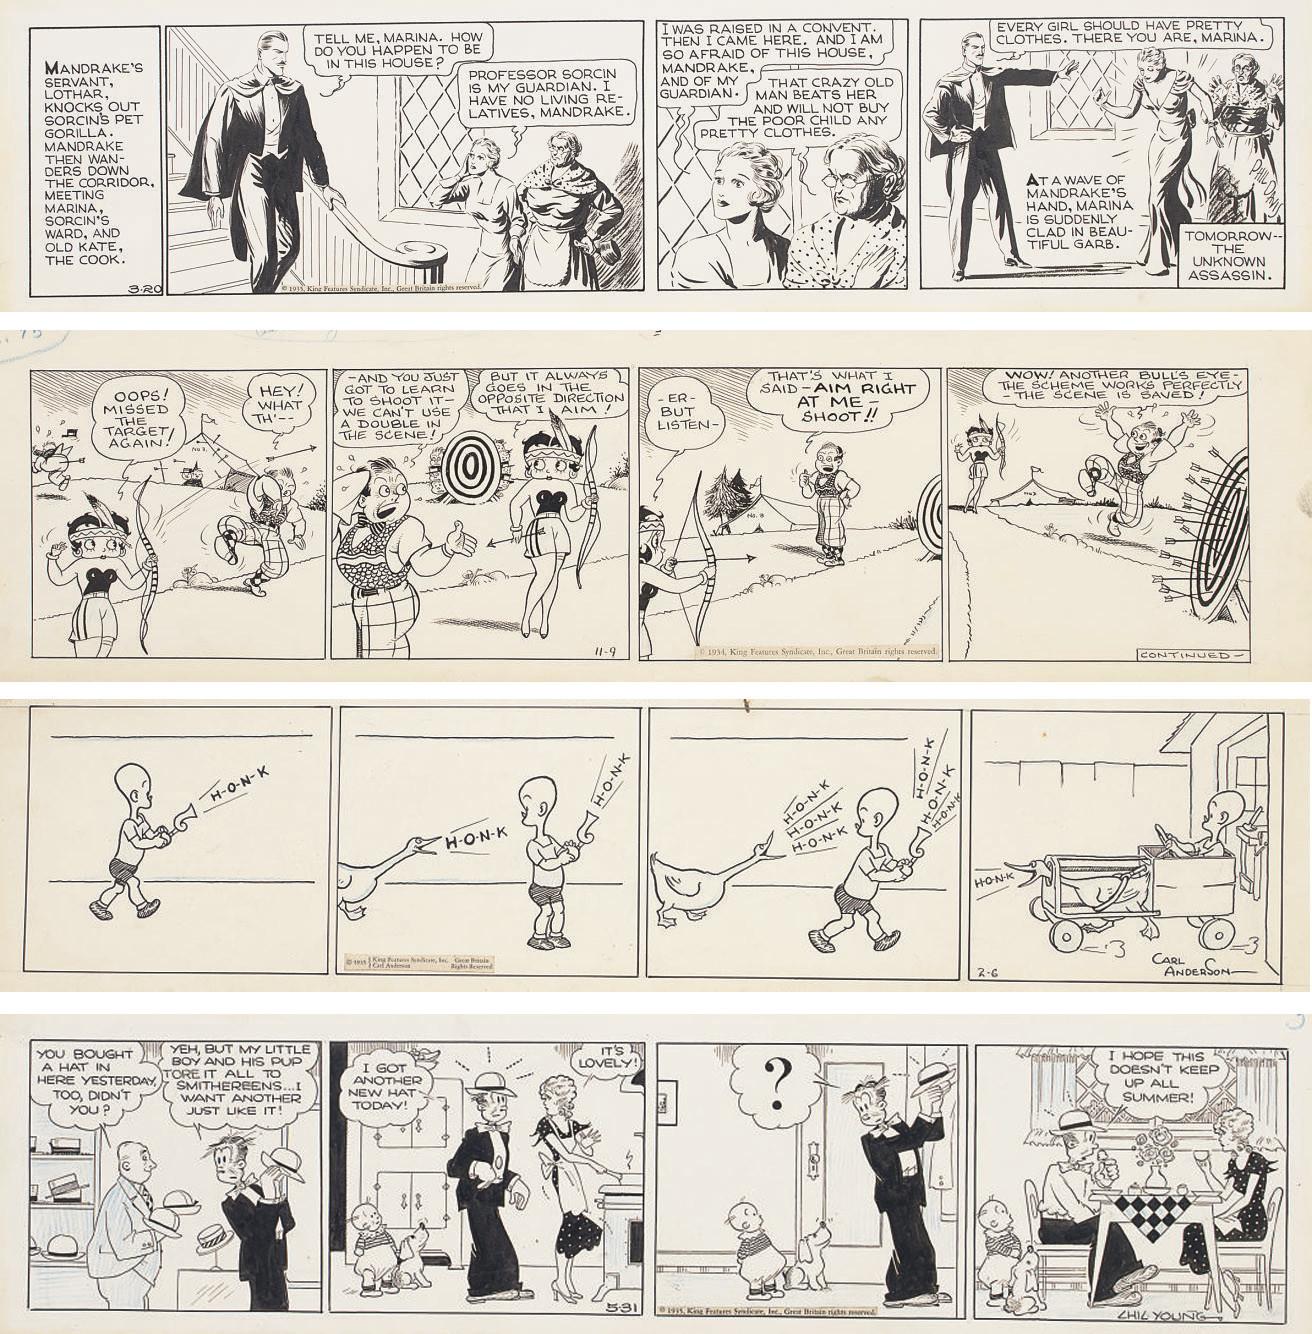 Daily Comic Strips, c. 1930s